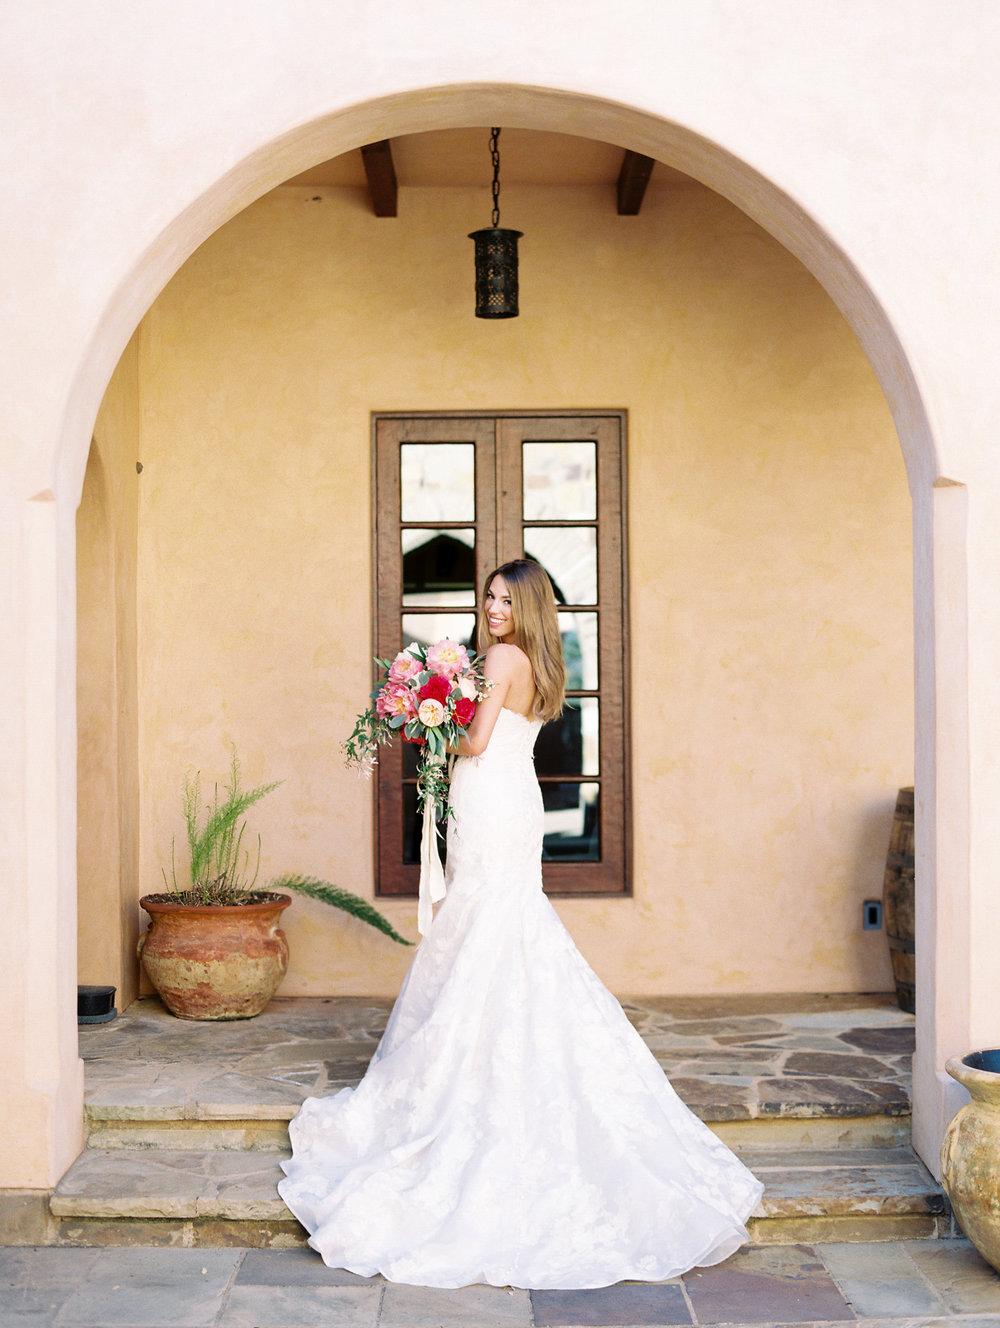 Escondido-Golf_Lake-Club-Hill-Country-Houston-Wedding-Photographer-Best-Top-Luxury-Destination-Engagements-Portrait-Austin-Photography-14.jpg